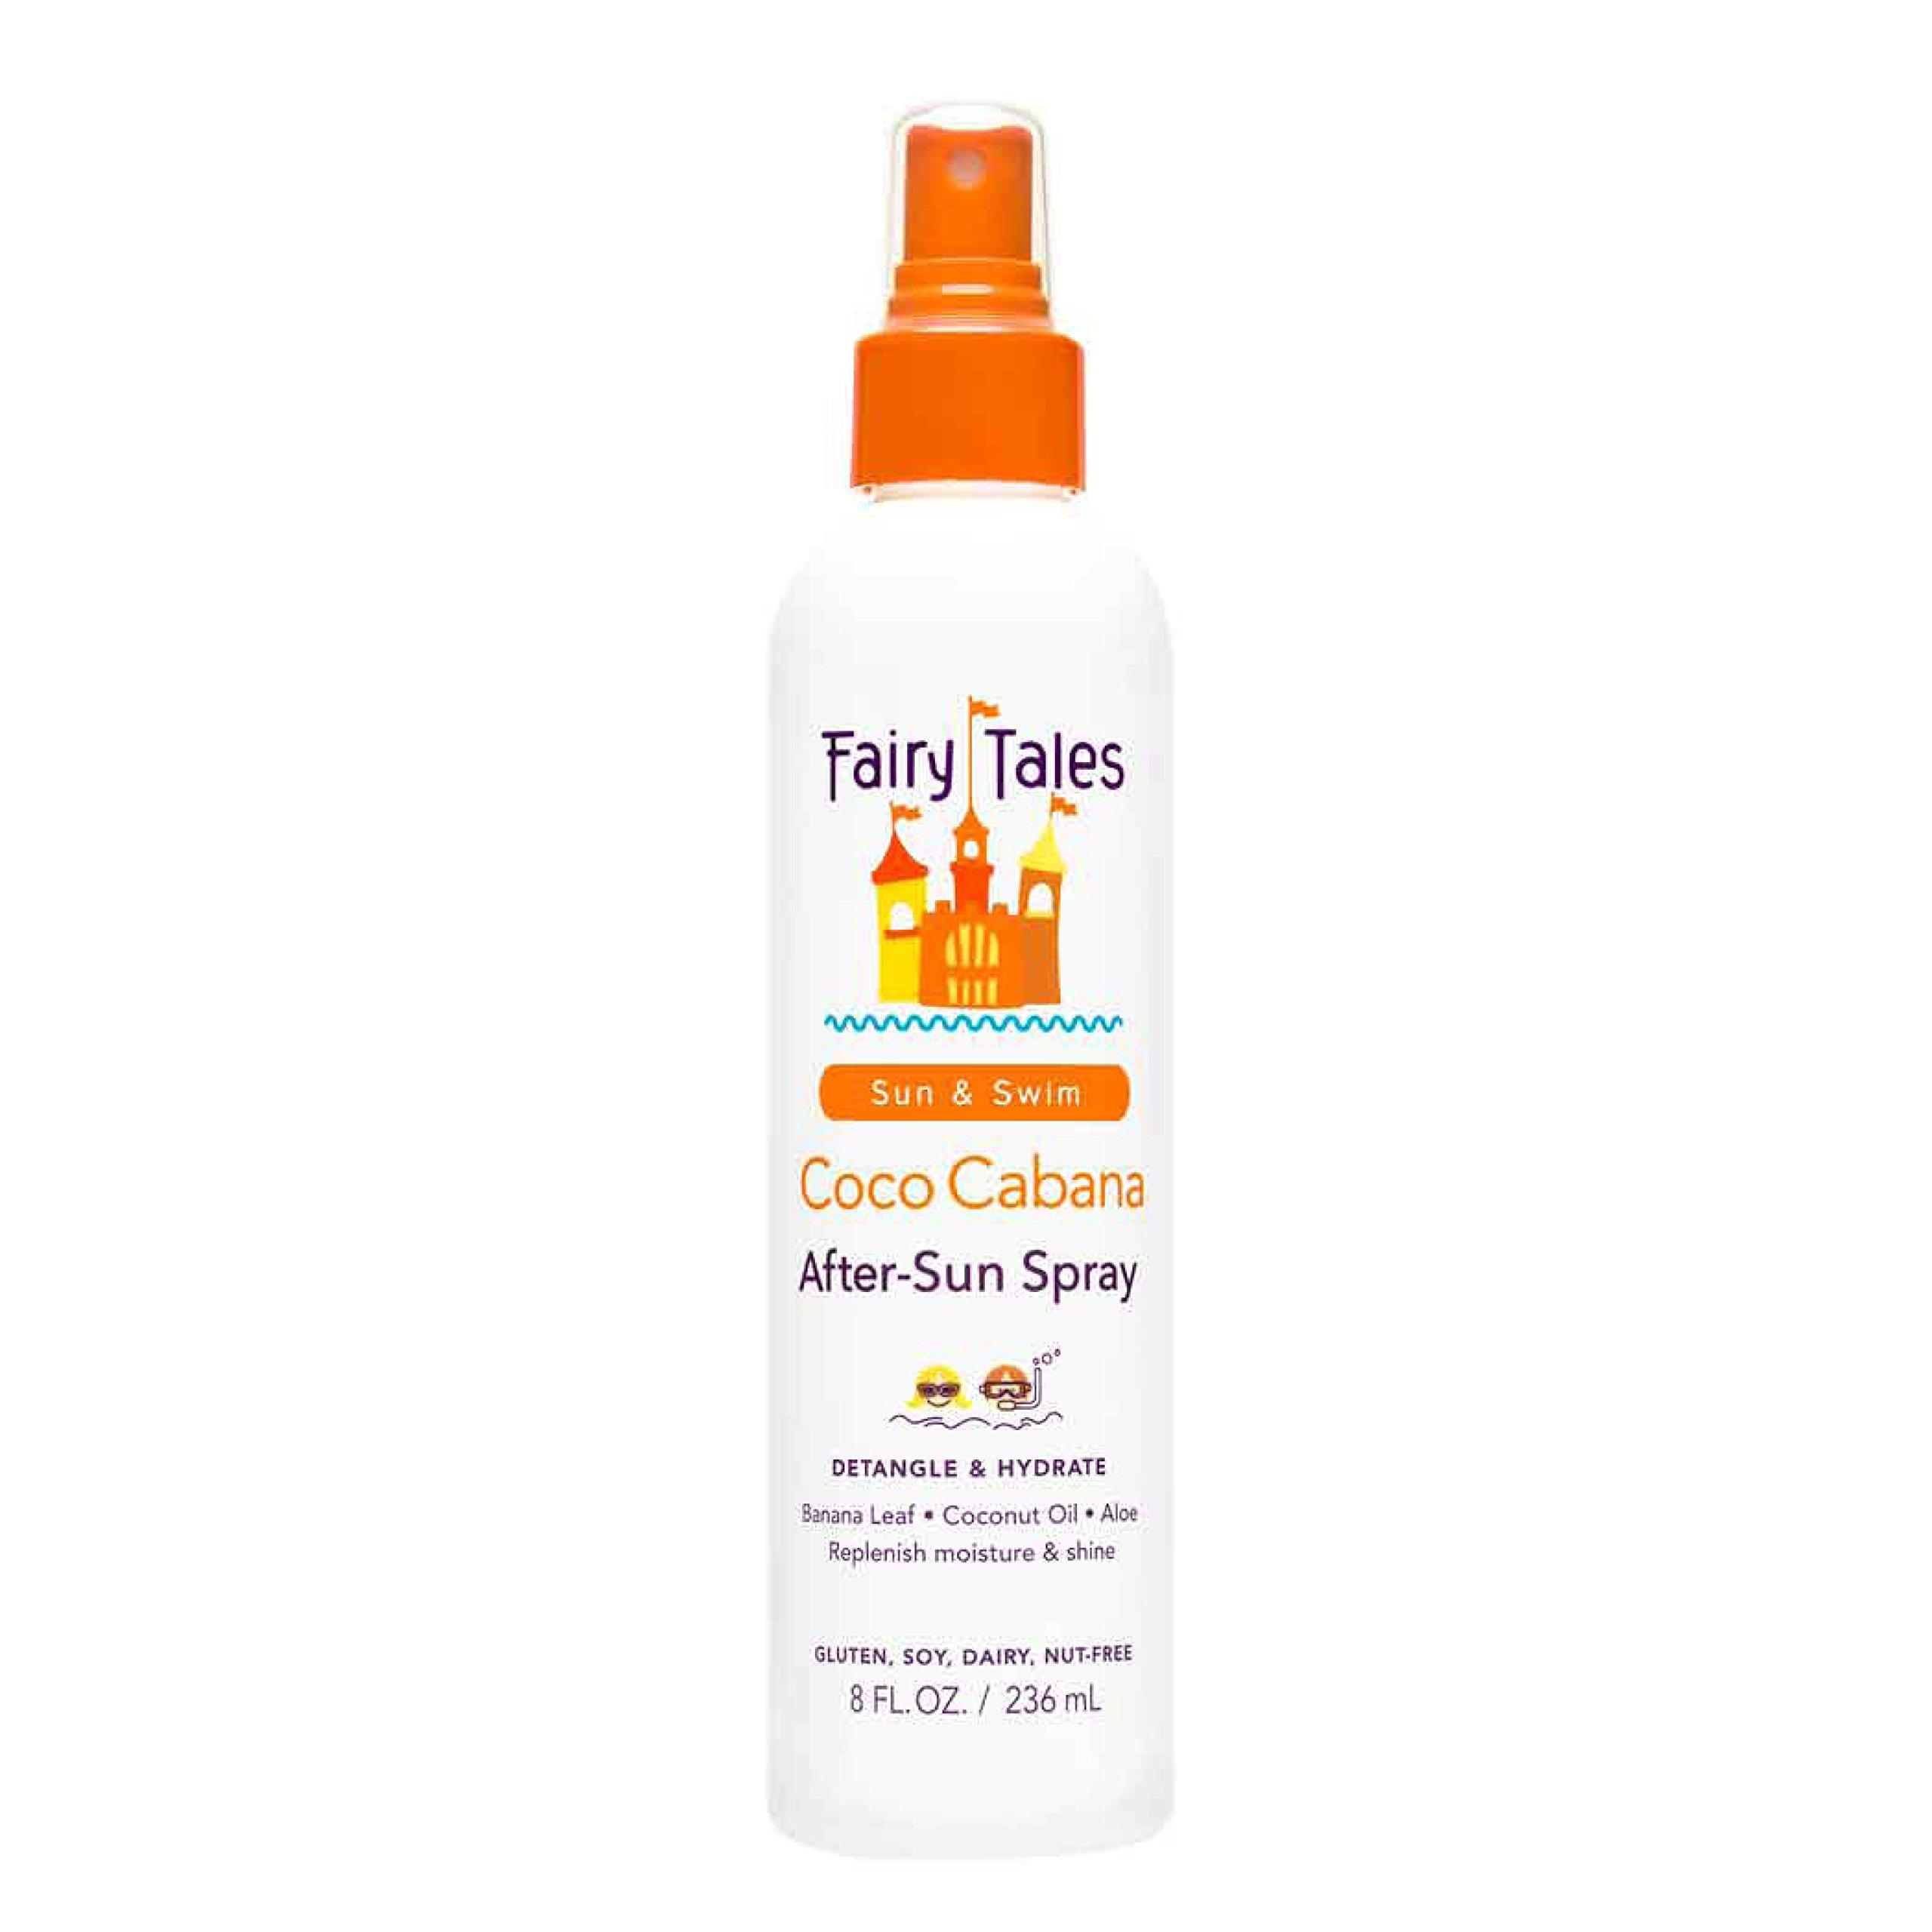 Fairy Tales Sun & Swim Coco Cabana After-Sun Spray for Kids - 8 oz by Fairy Tales